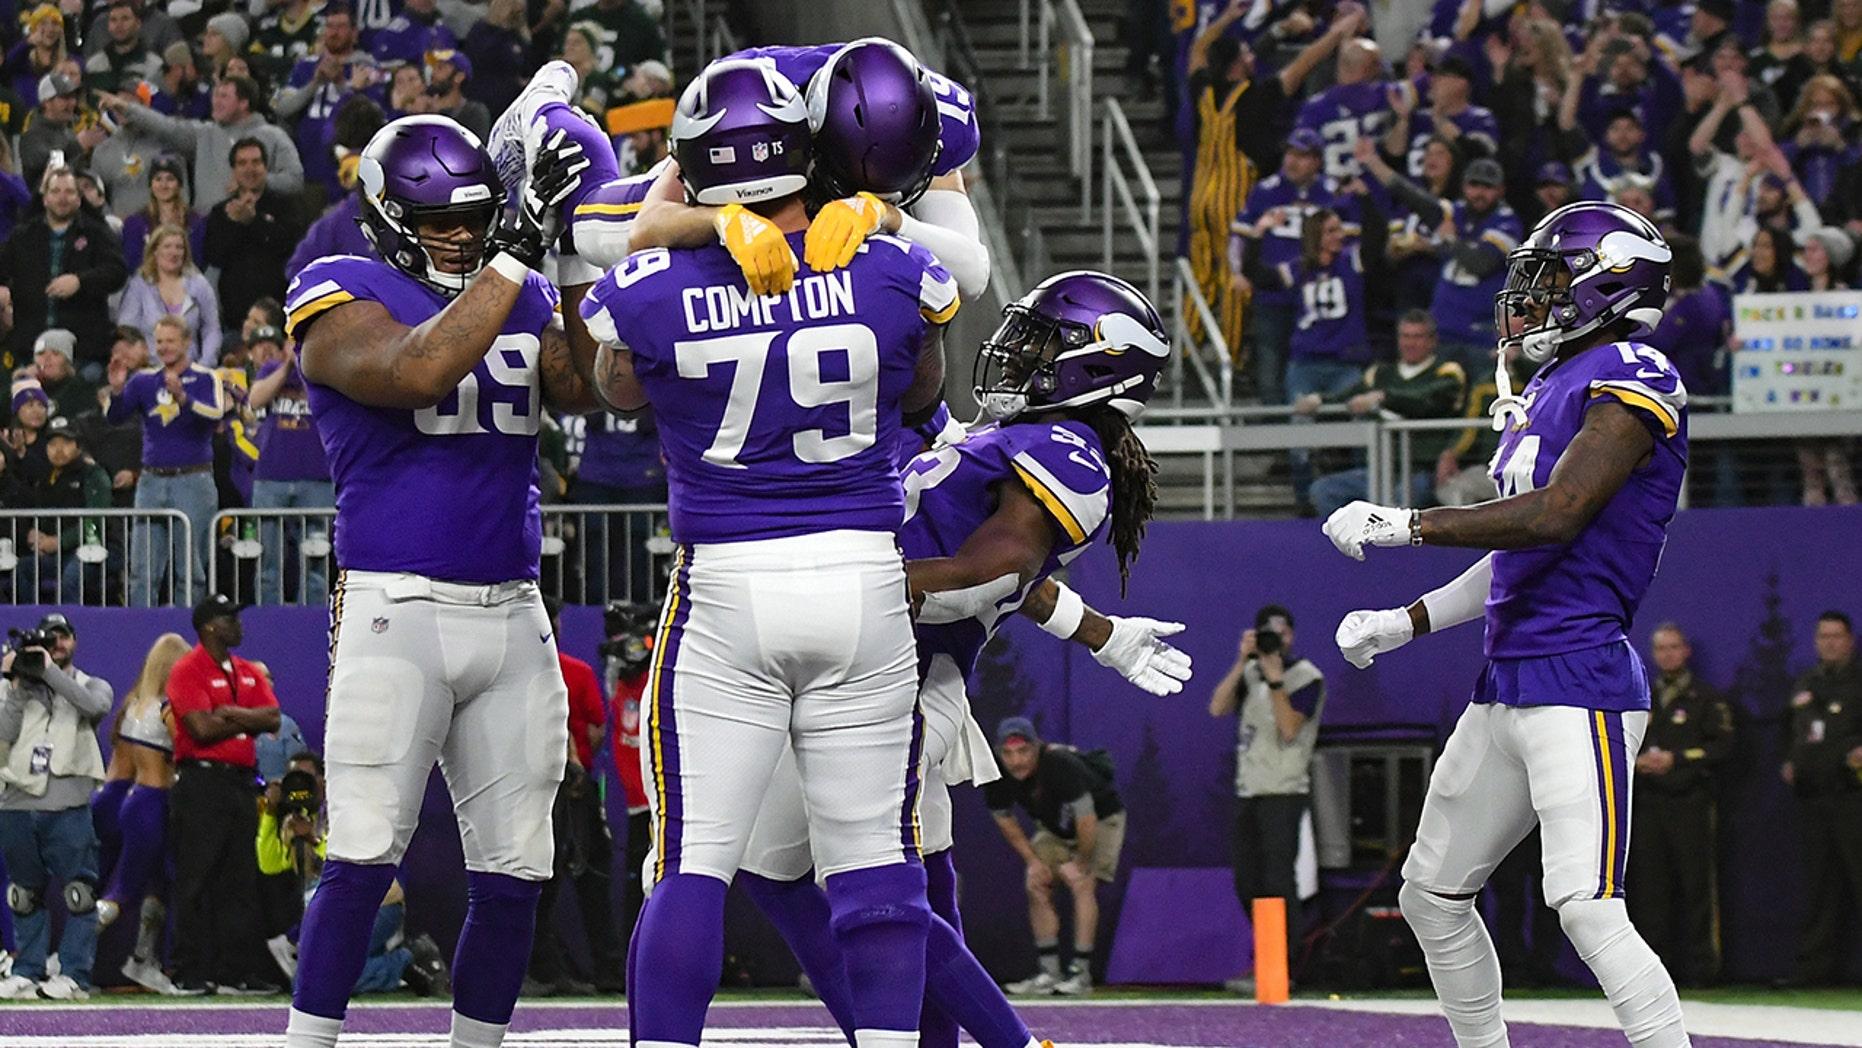 The Vikings celebrate a touchdown at U.S. Bank Stadium.